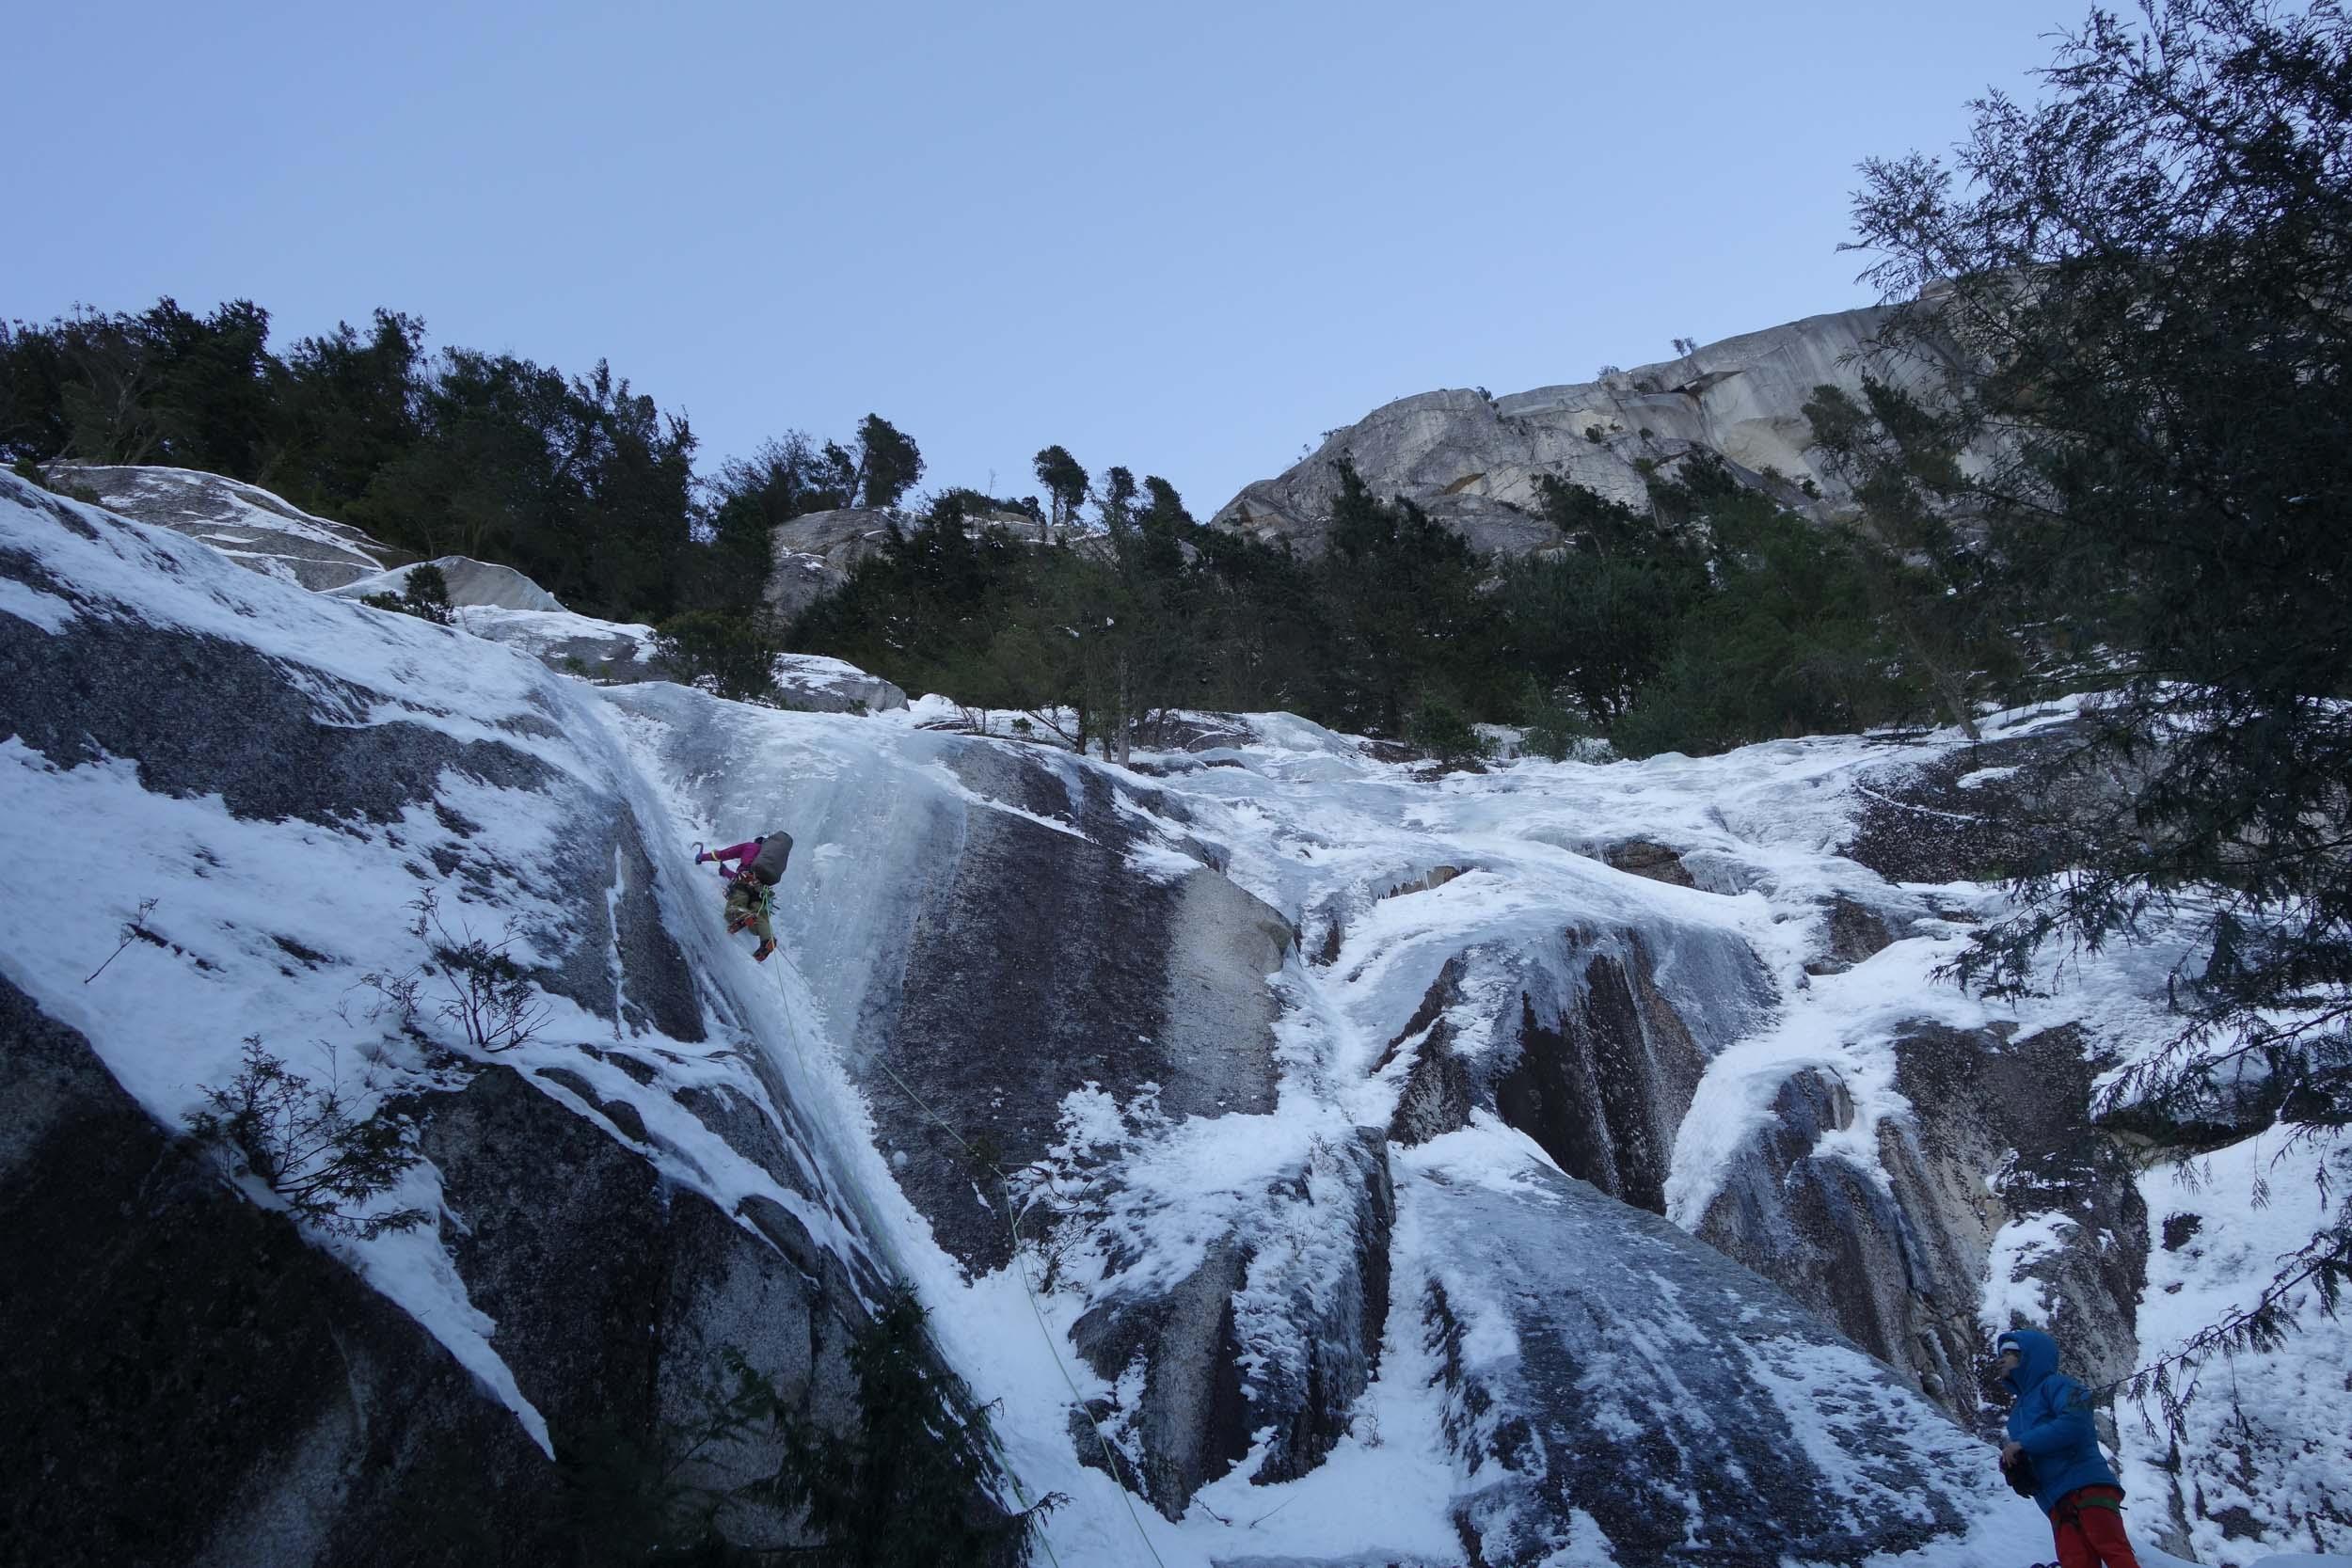 RAINFOREST ICE | Jason Kruk and Paul McSorley In Squamish